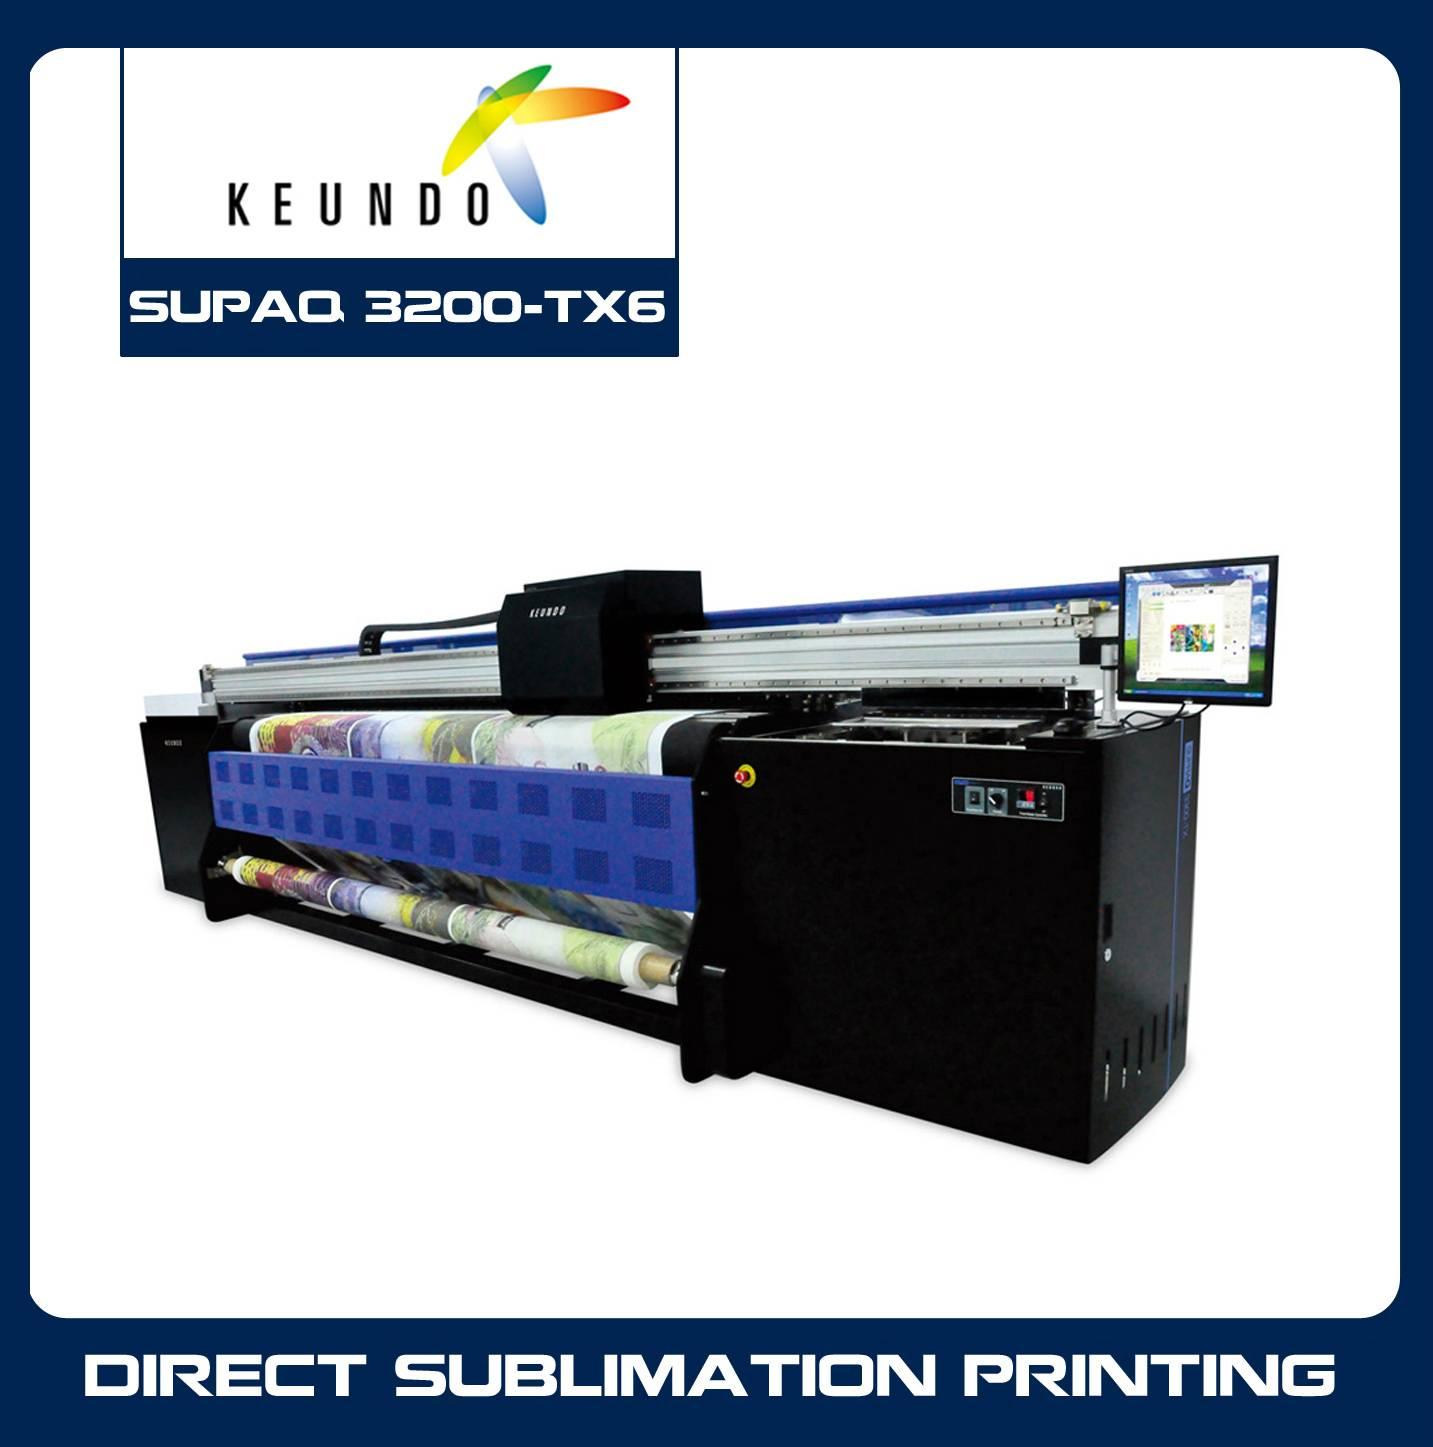 KEUNDO SUPRAQ 3200-TX6 Grand Format Dye Sublimation System